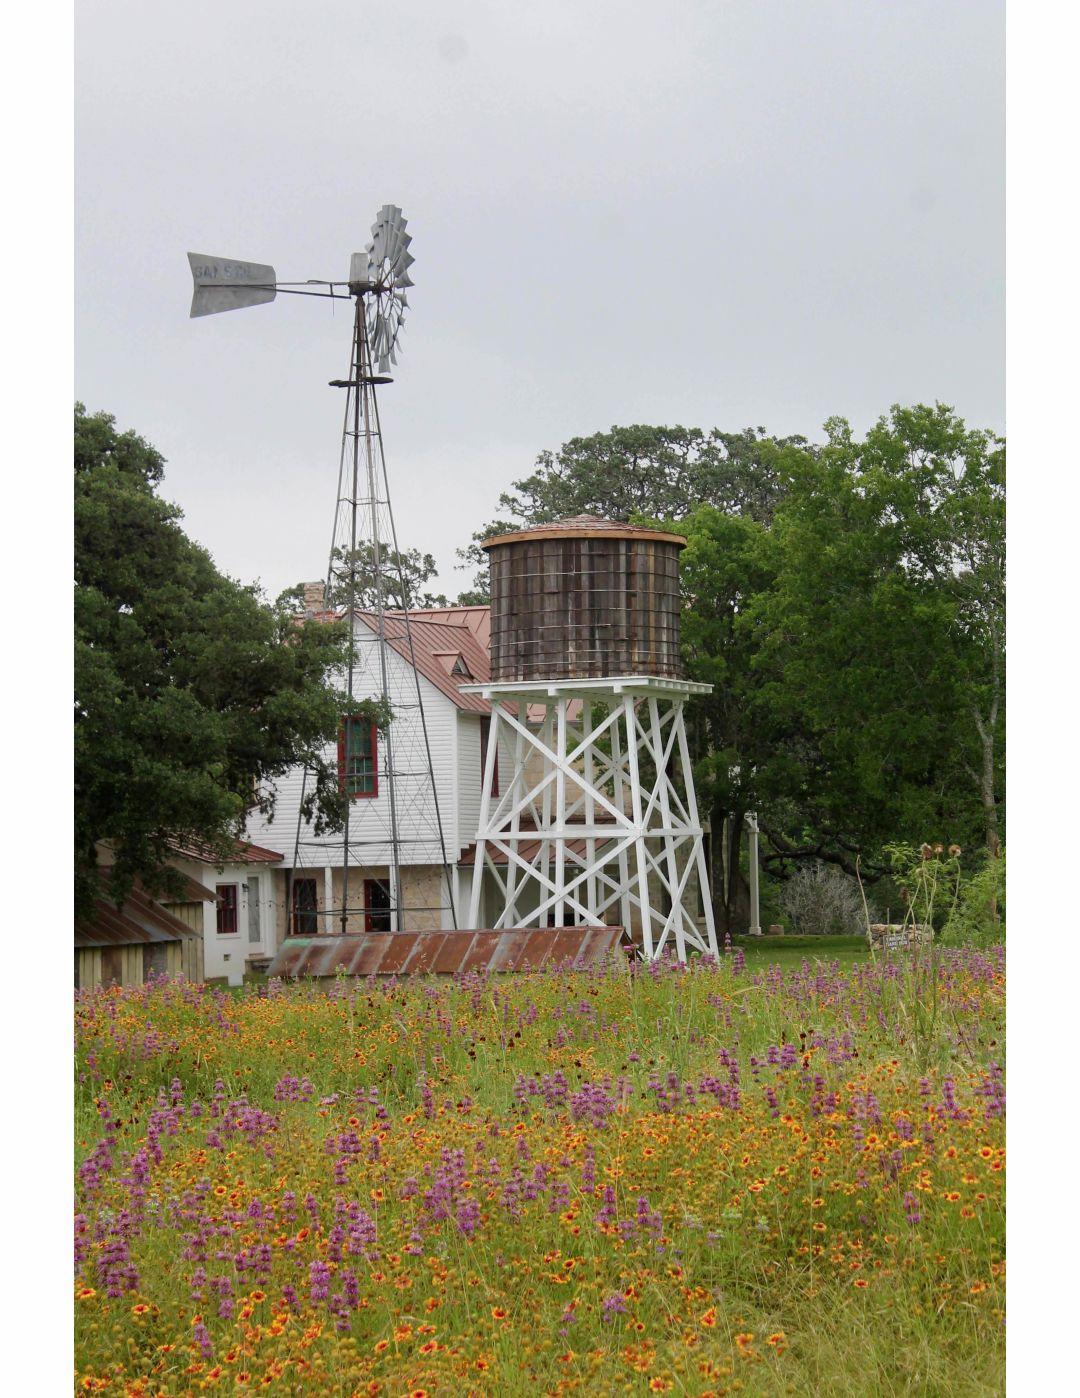 Herff farm uquegv